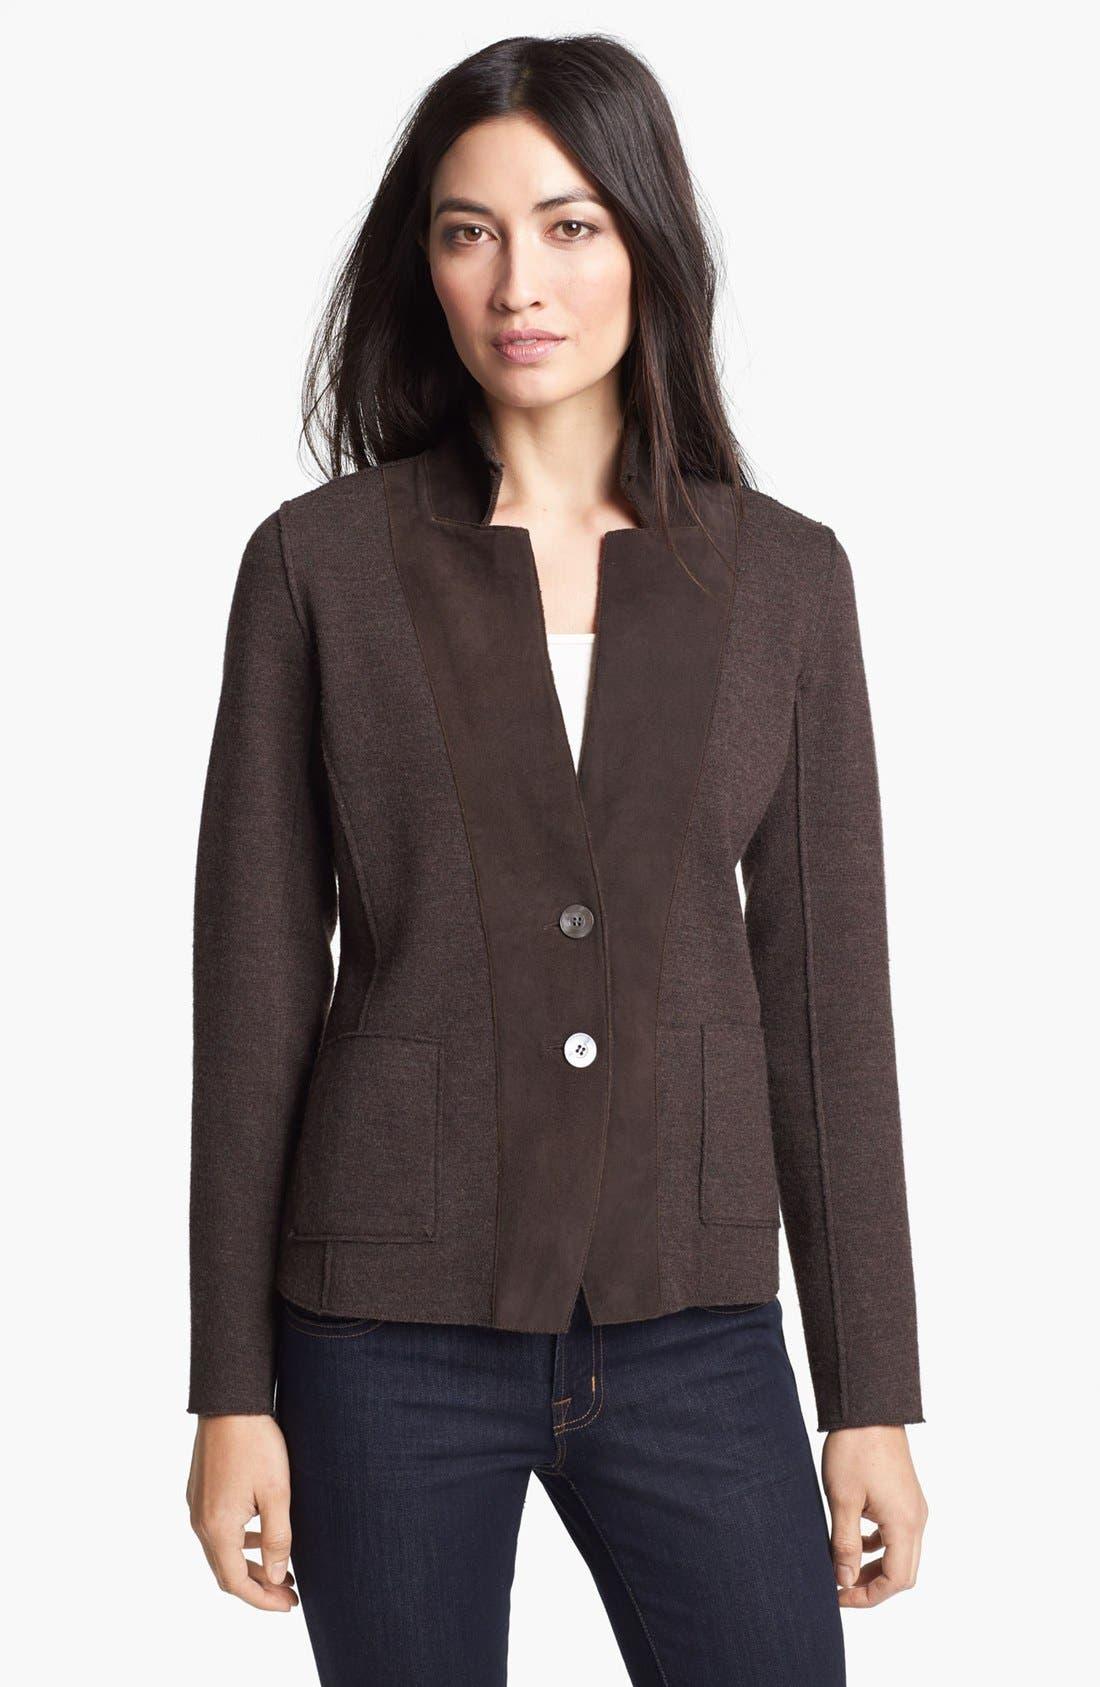 Alternate Image 1 Selected - Eileen Fisher Leather Trim Merino Blend Jacket